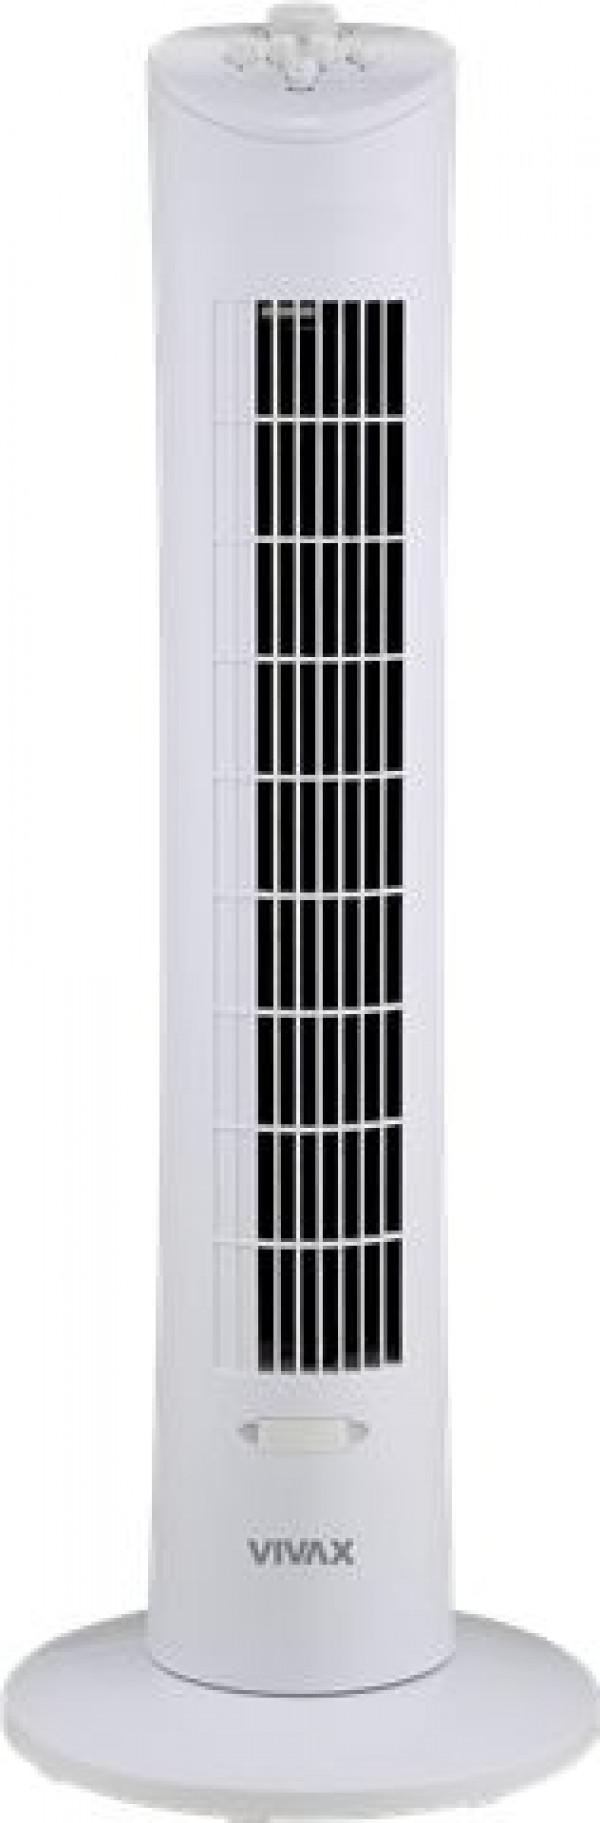 VIVAX HOME ventilator stubni TF-61